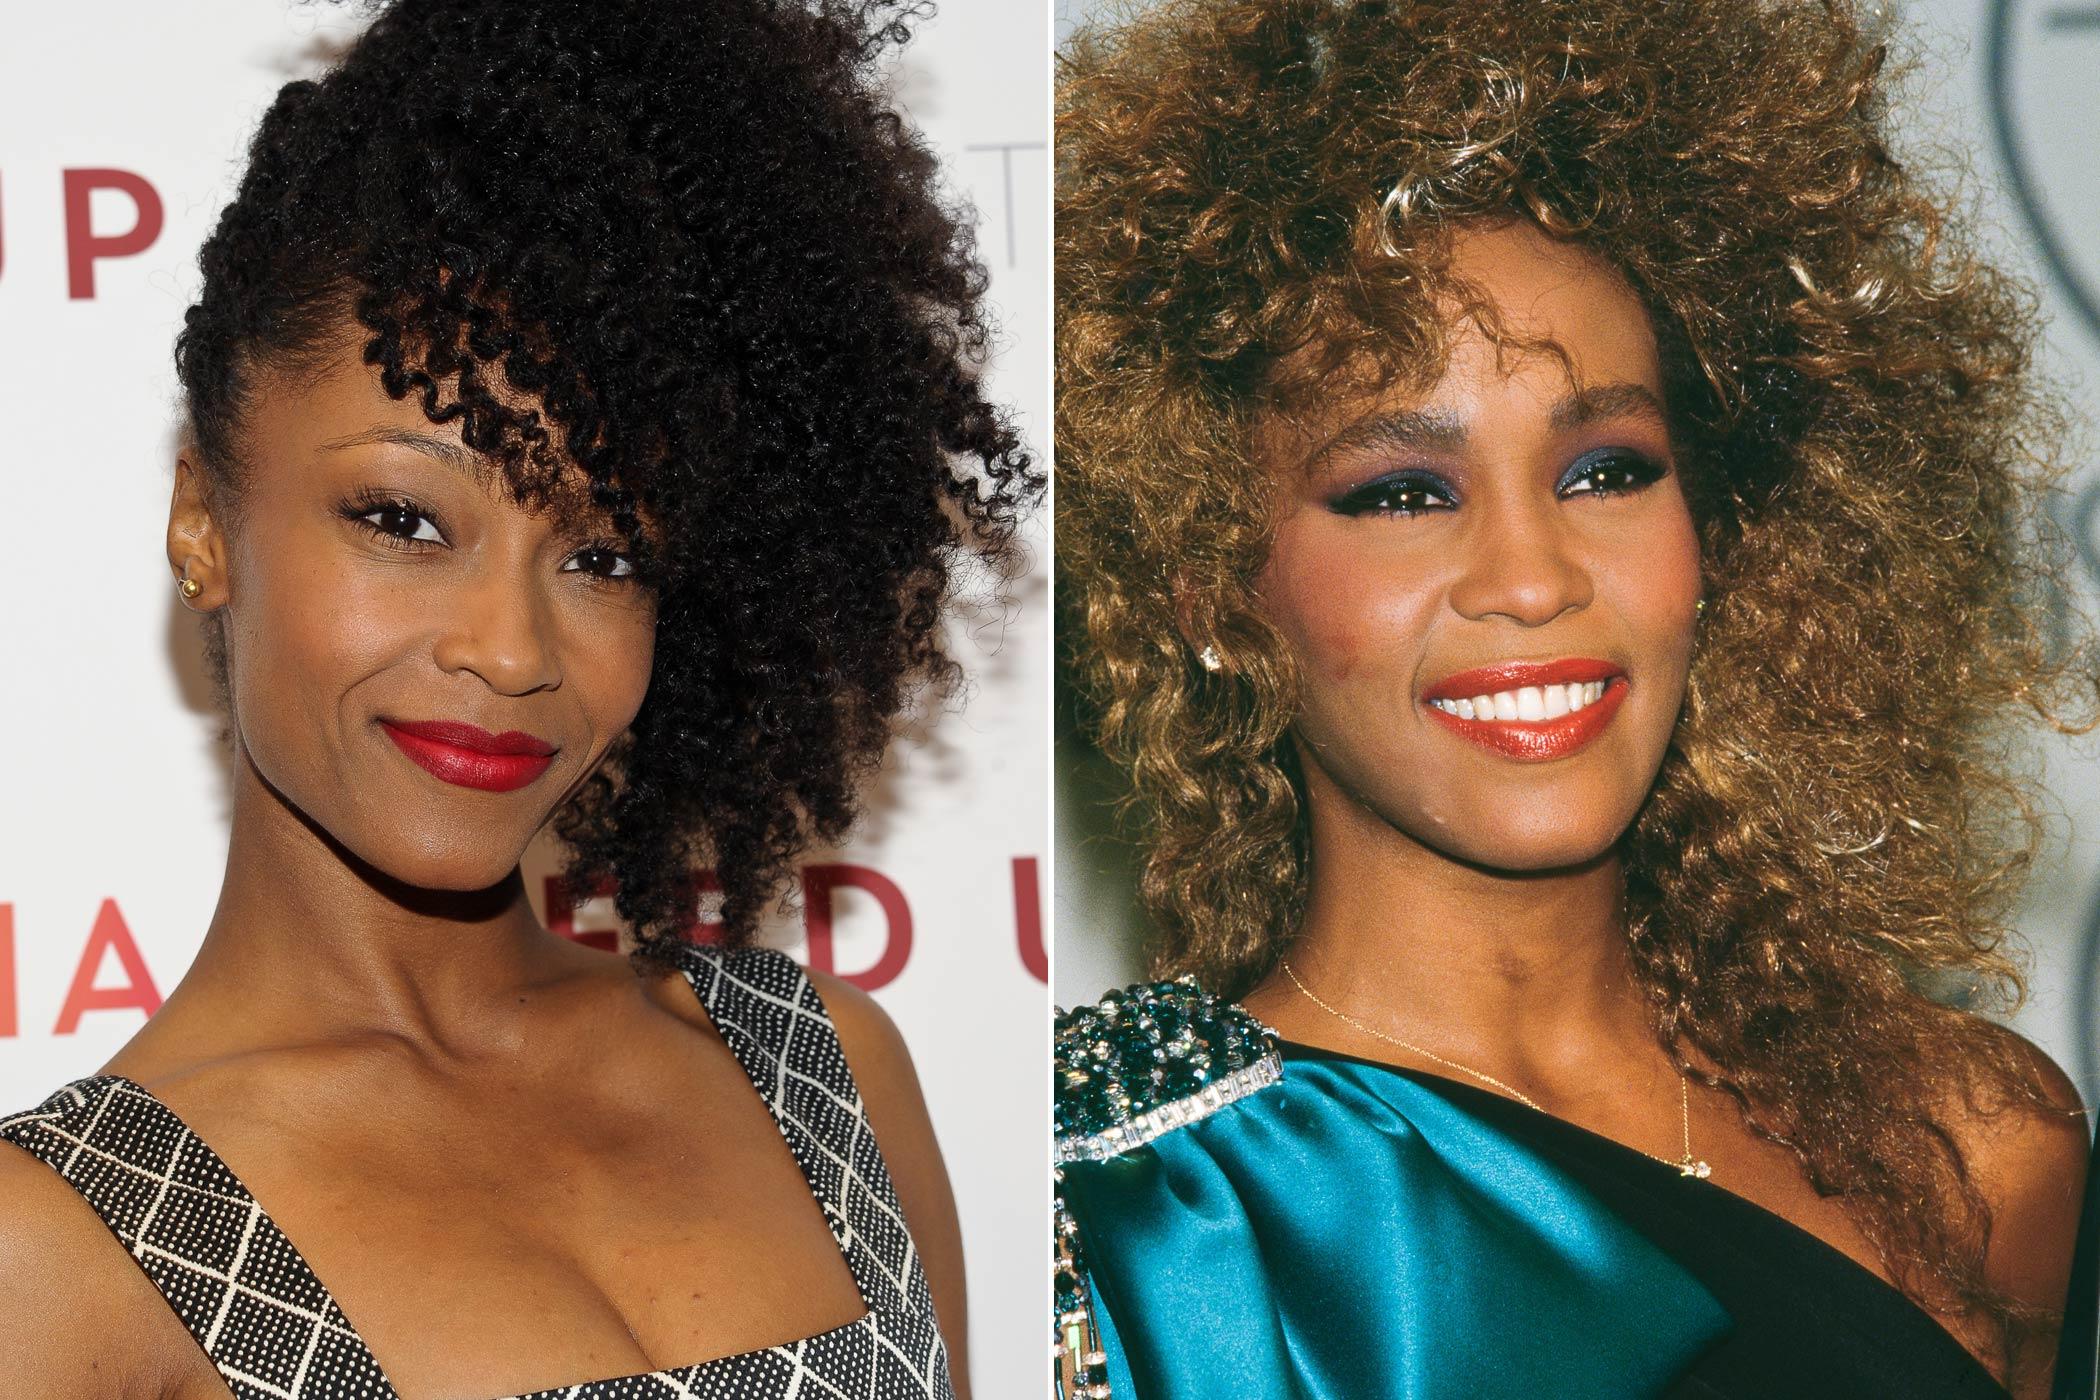 From left: Yaya Dacosta; Whitney Houston